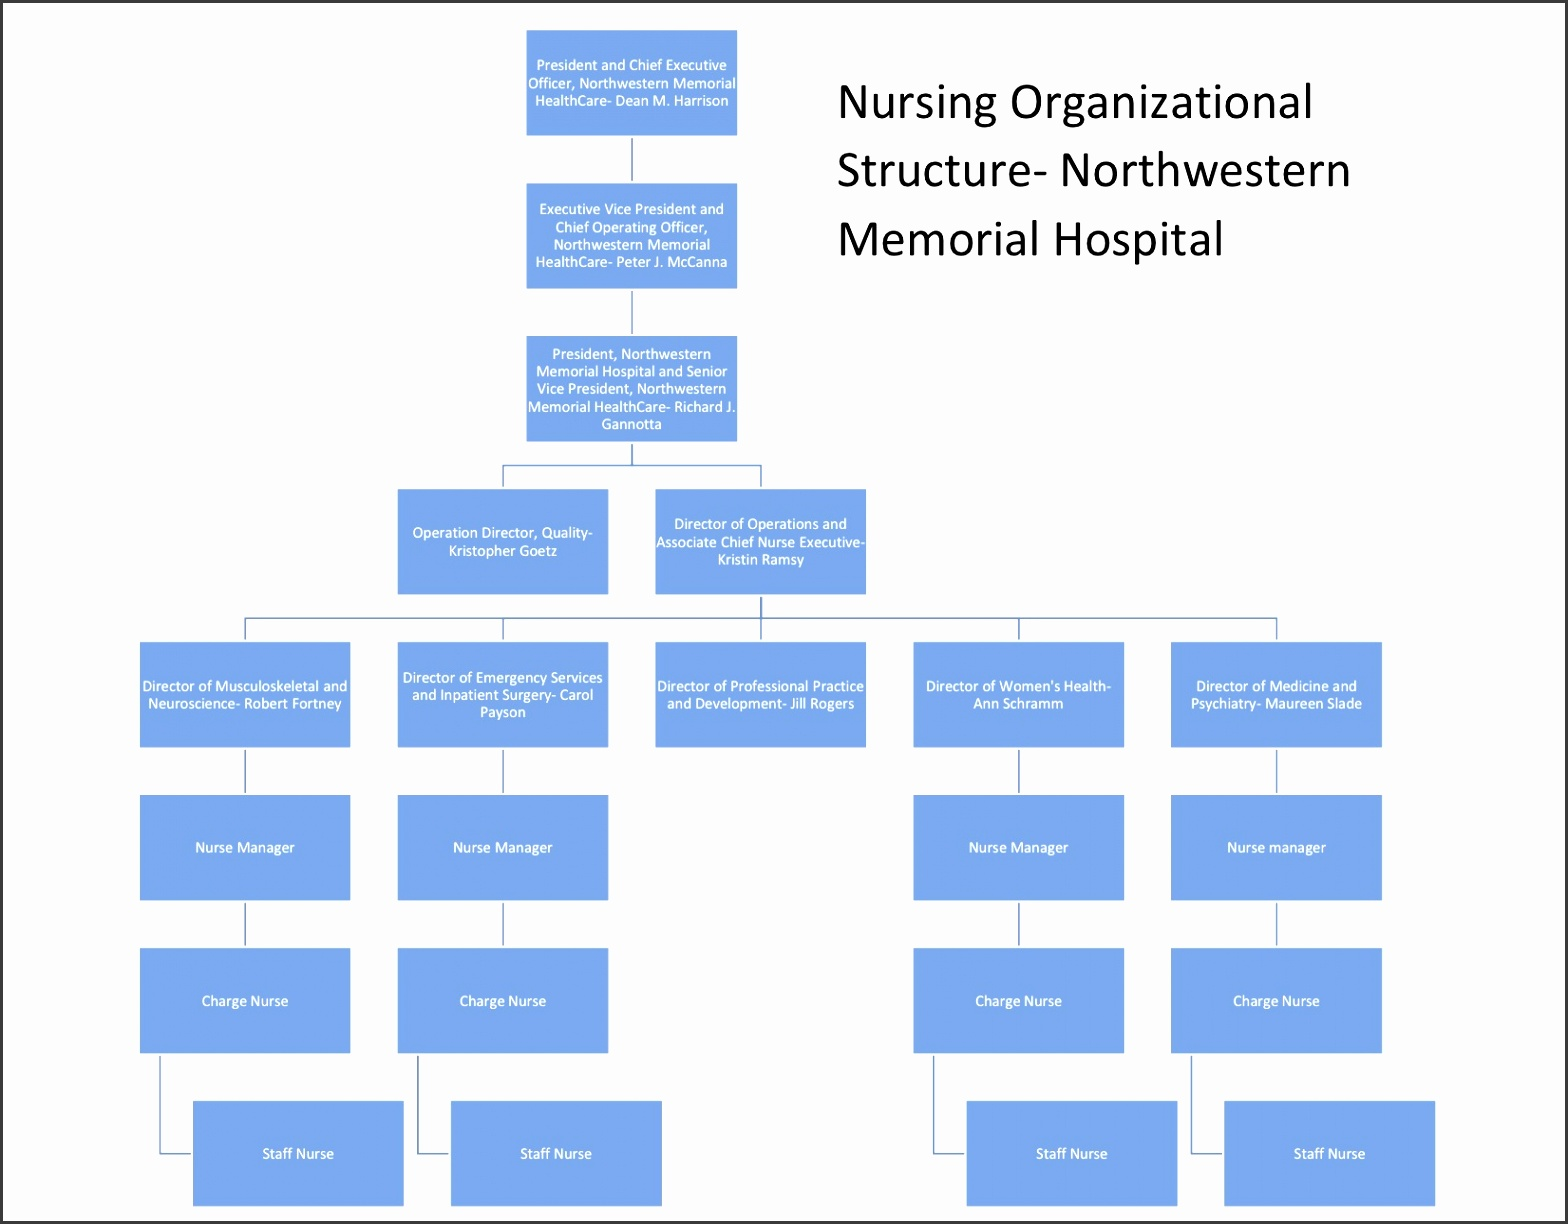 Northwestern Memorial Organizational Structure including Nursing